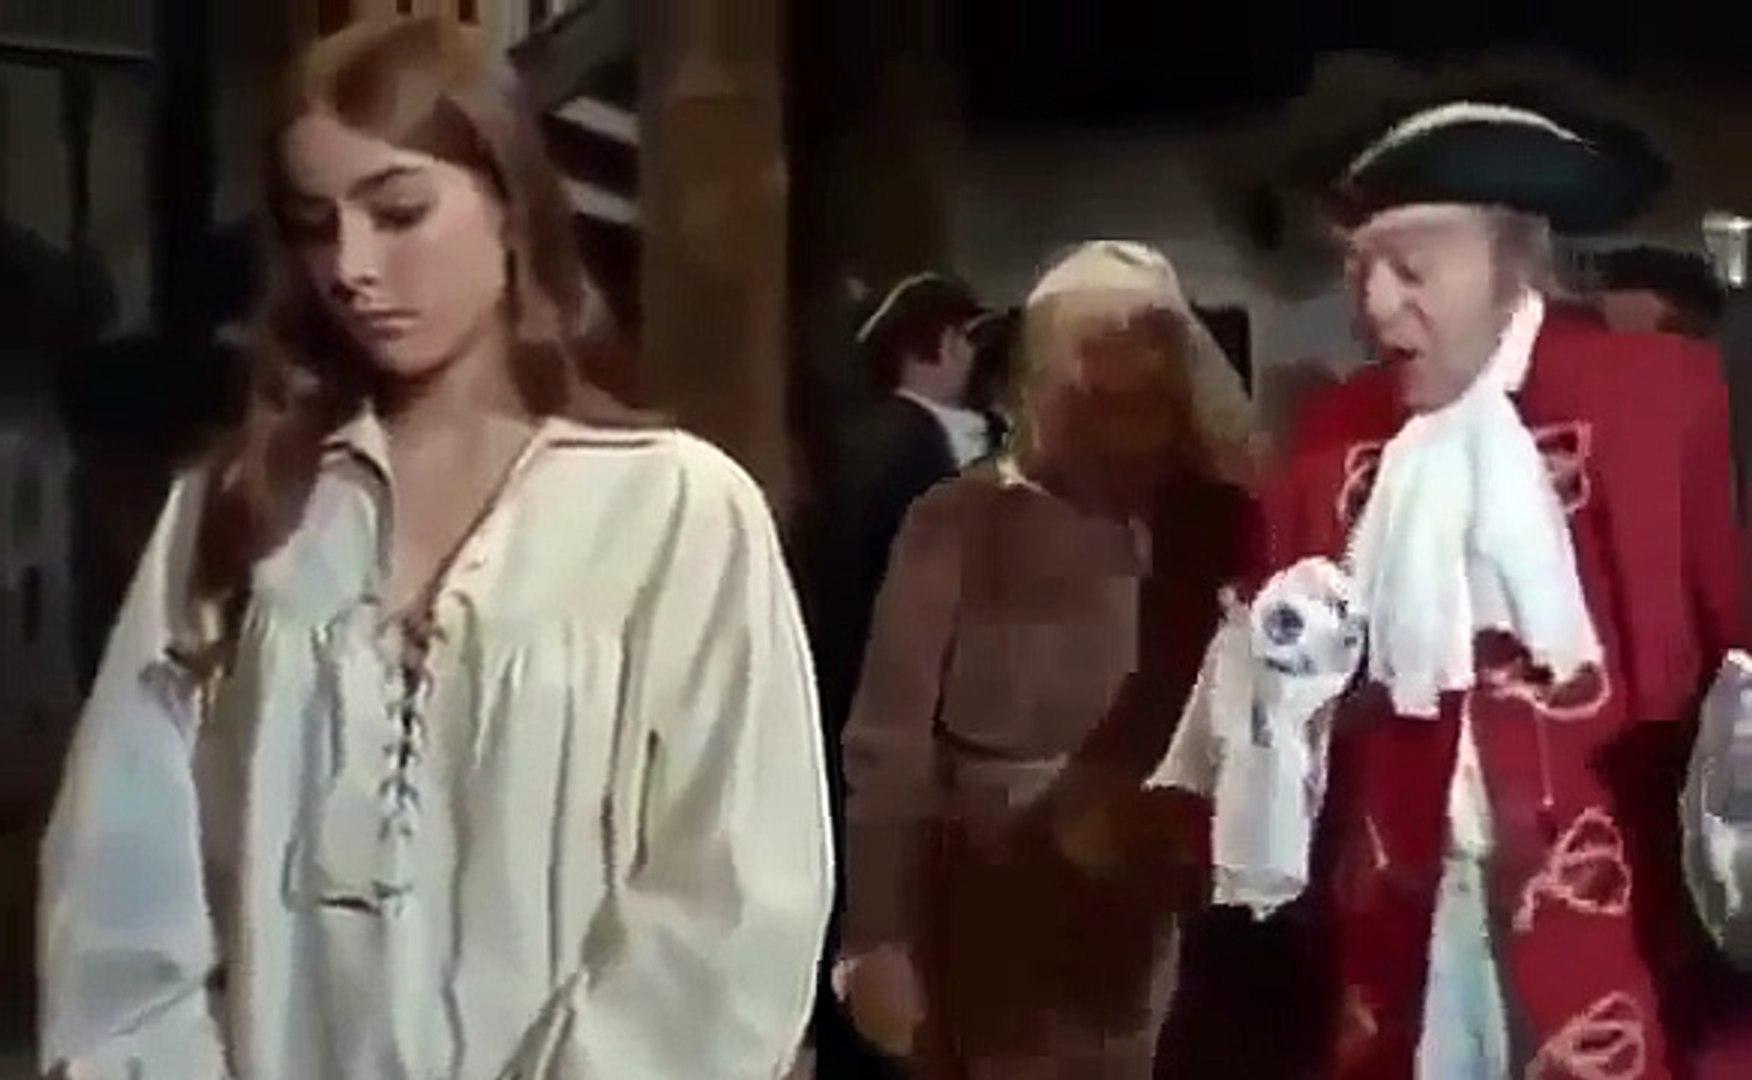 Marquis De Sade Justine 1969 West German Italian Film Cruel Passion Italian Part 1 3 Video Dailymotion